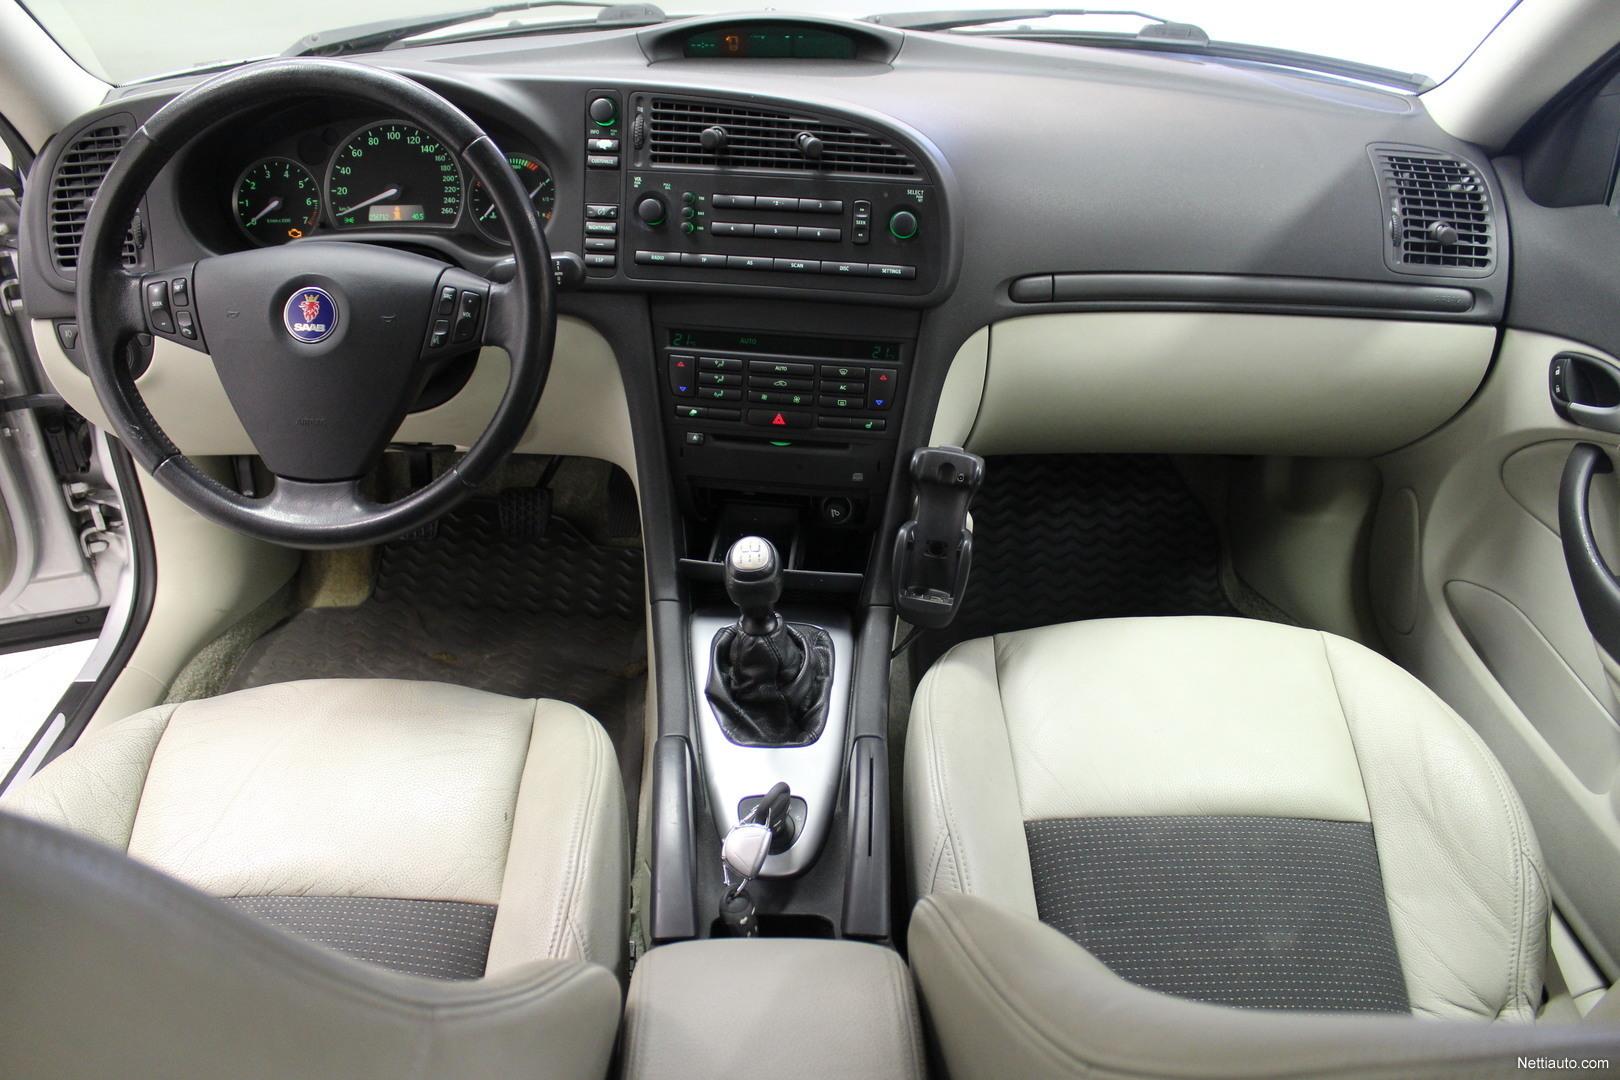 3 Wheel Car For Sale >> Saab 9 3 Sedan 2 0t 1 Omistajalta Xenon Suomi Auto